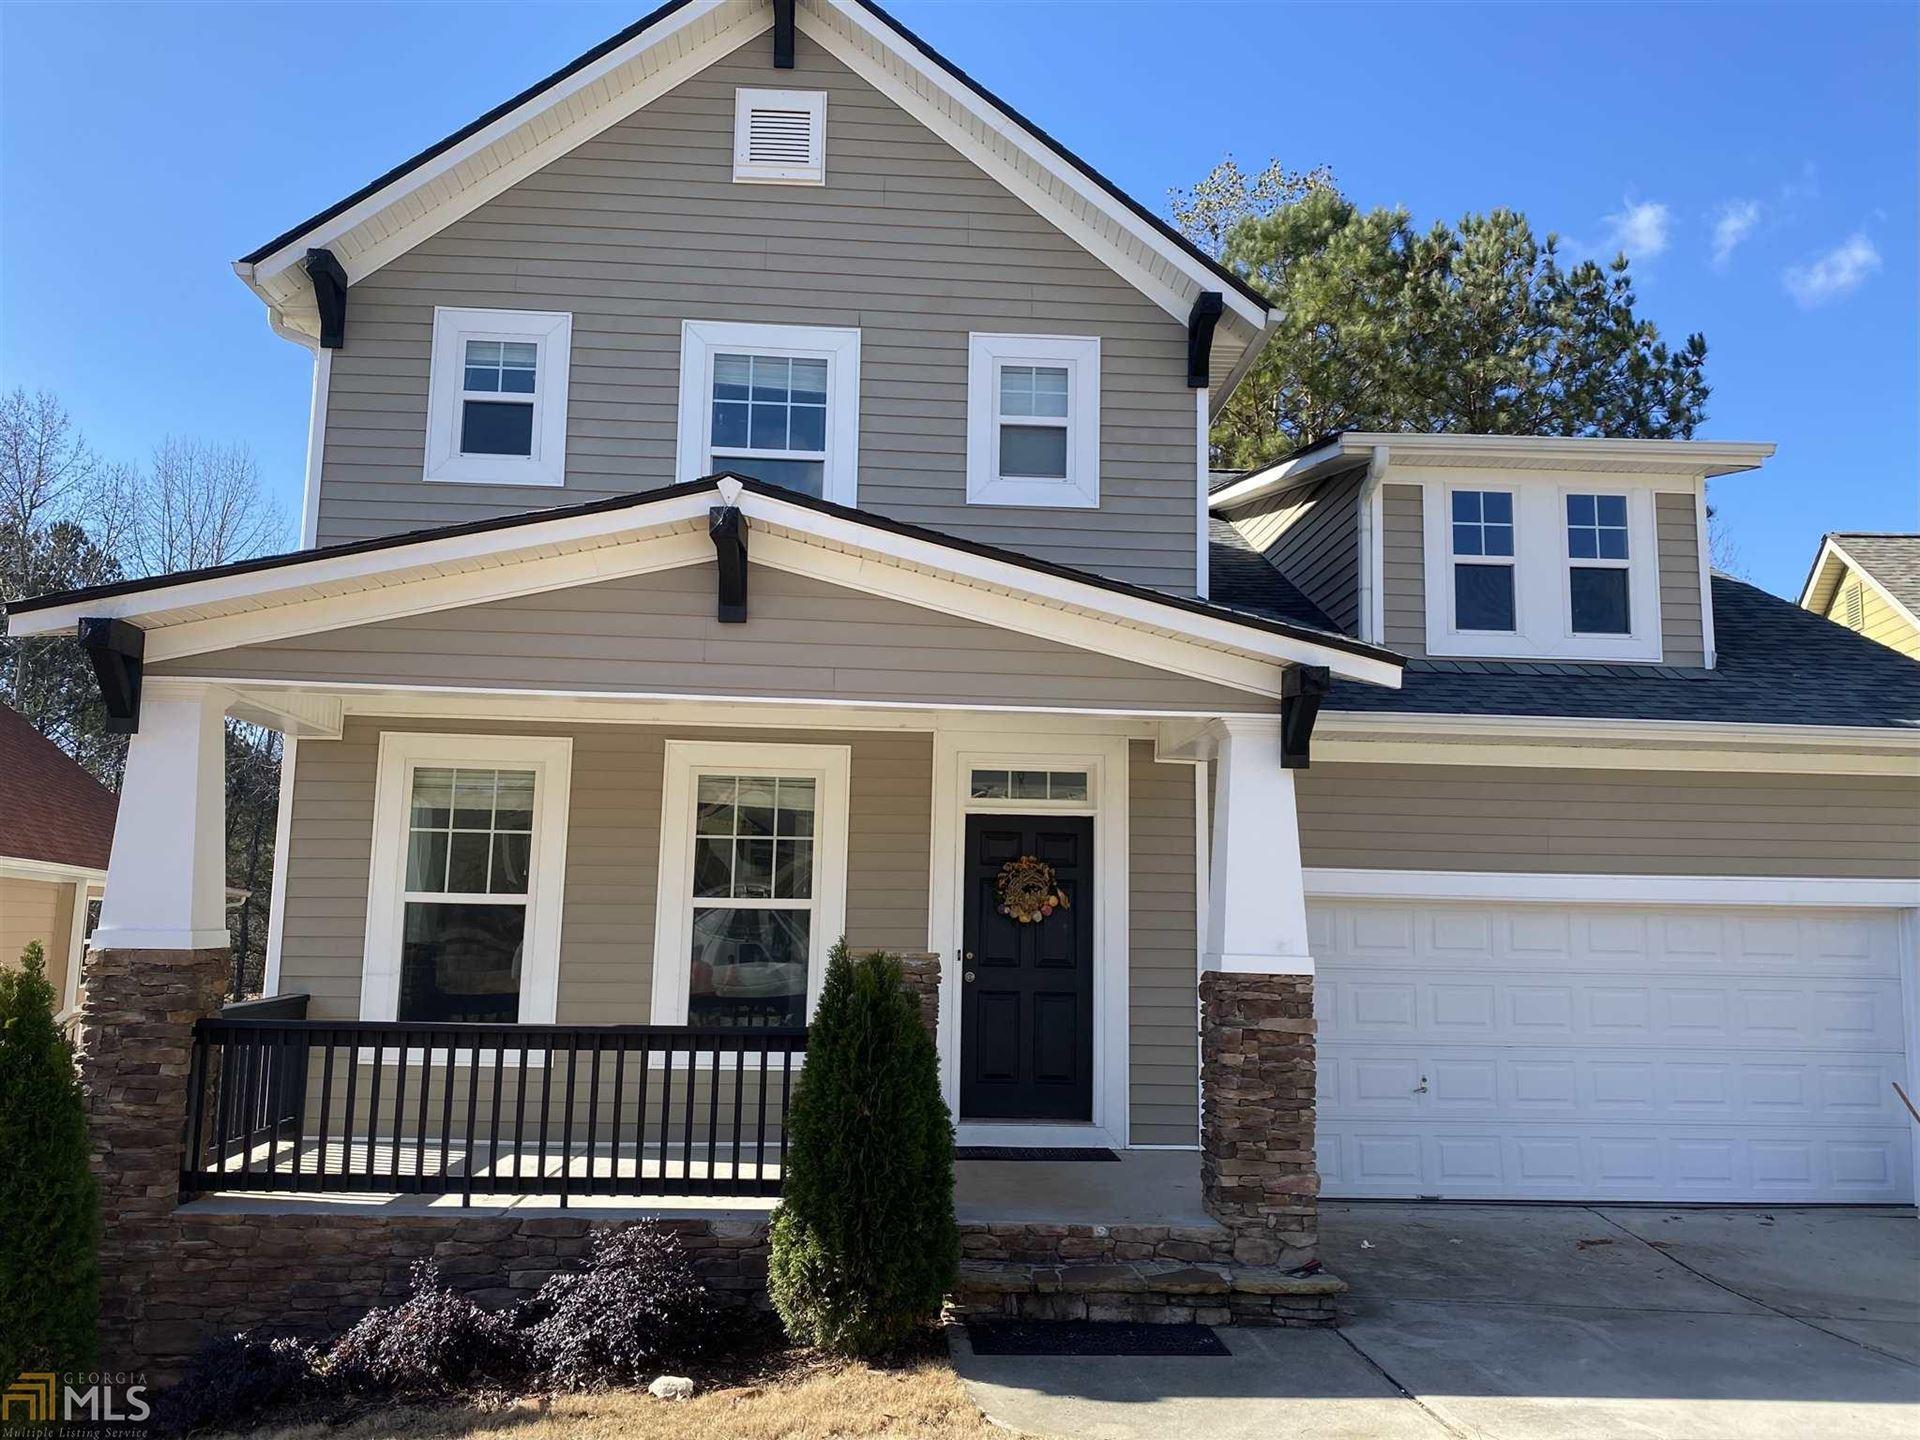 152 Greenview Dr, Newnan, GA 30265 - MLS#: 8904830